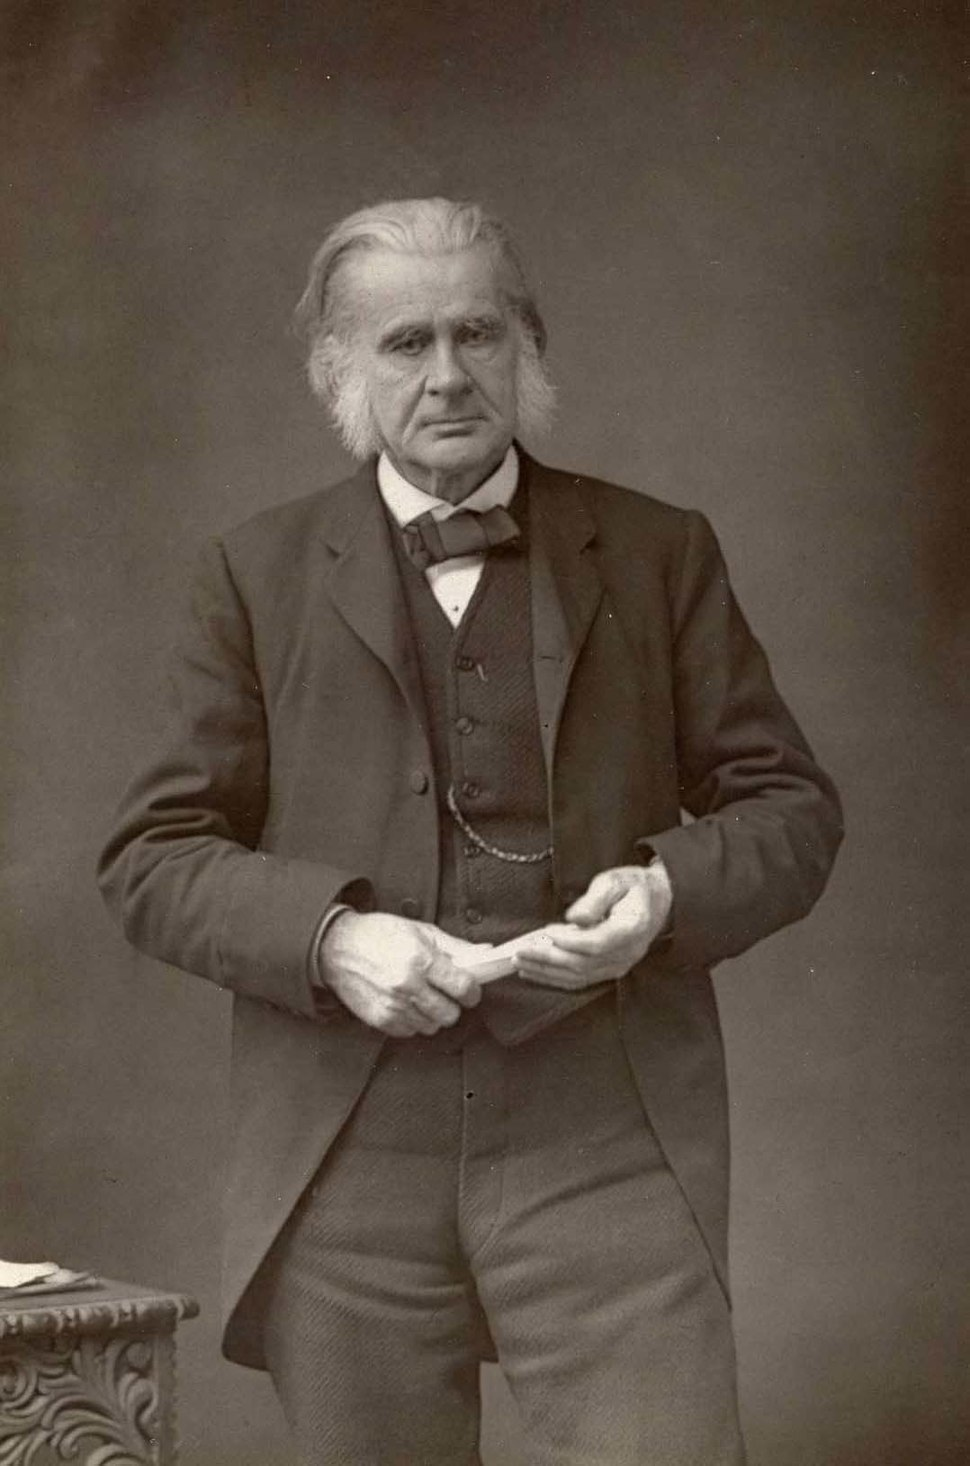 Huxley, Thomas Henry (1825 - 1895) by Daniel Downey (1829-1881) - 1863-9